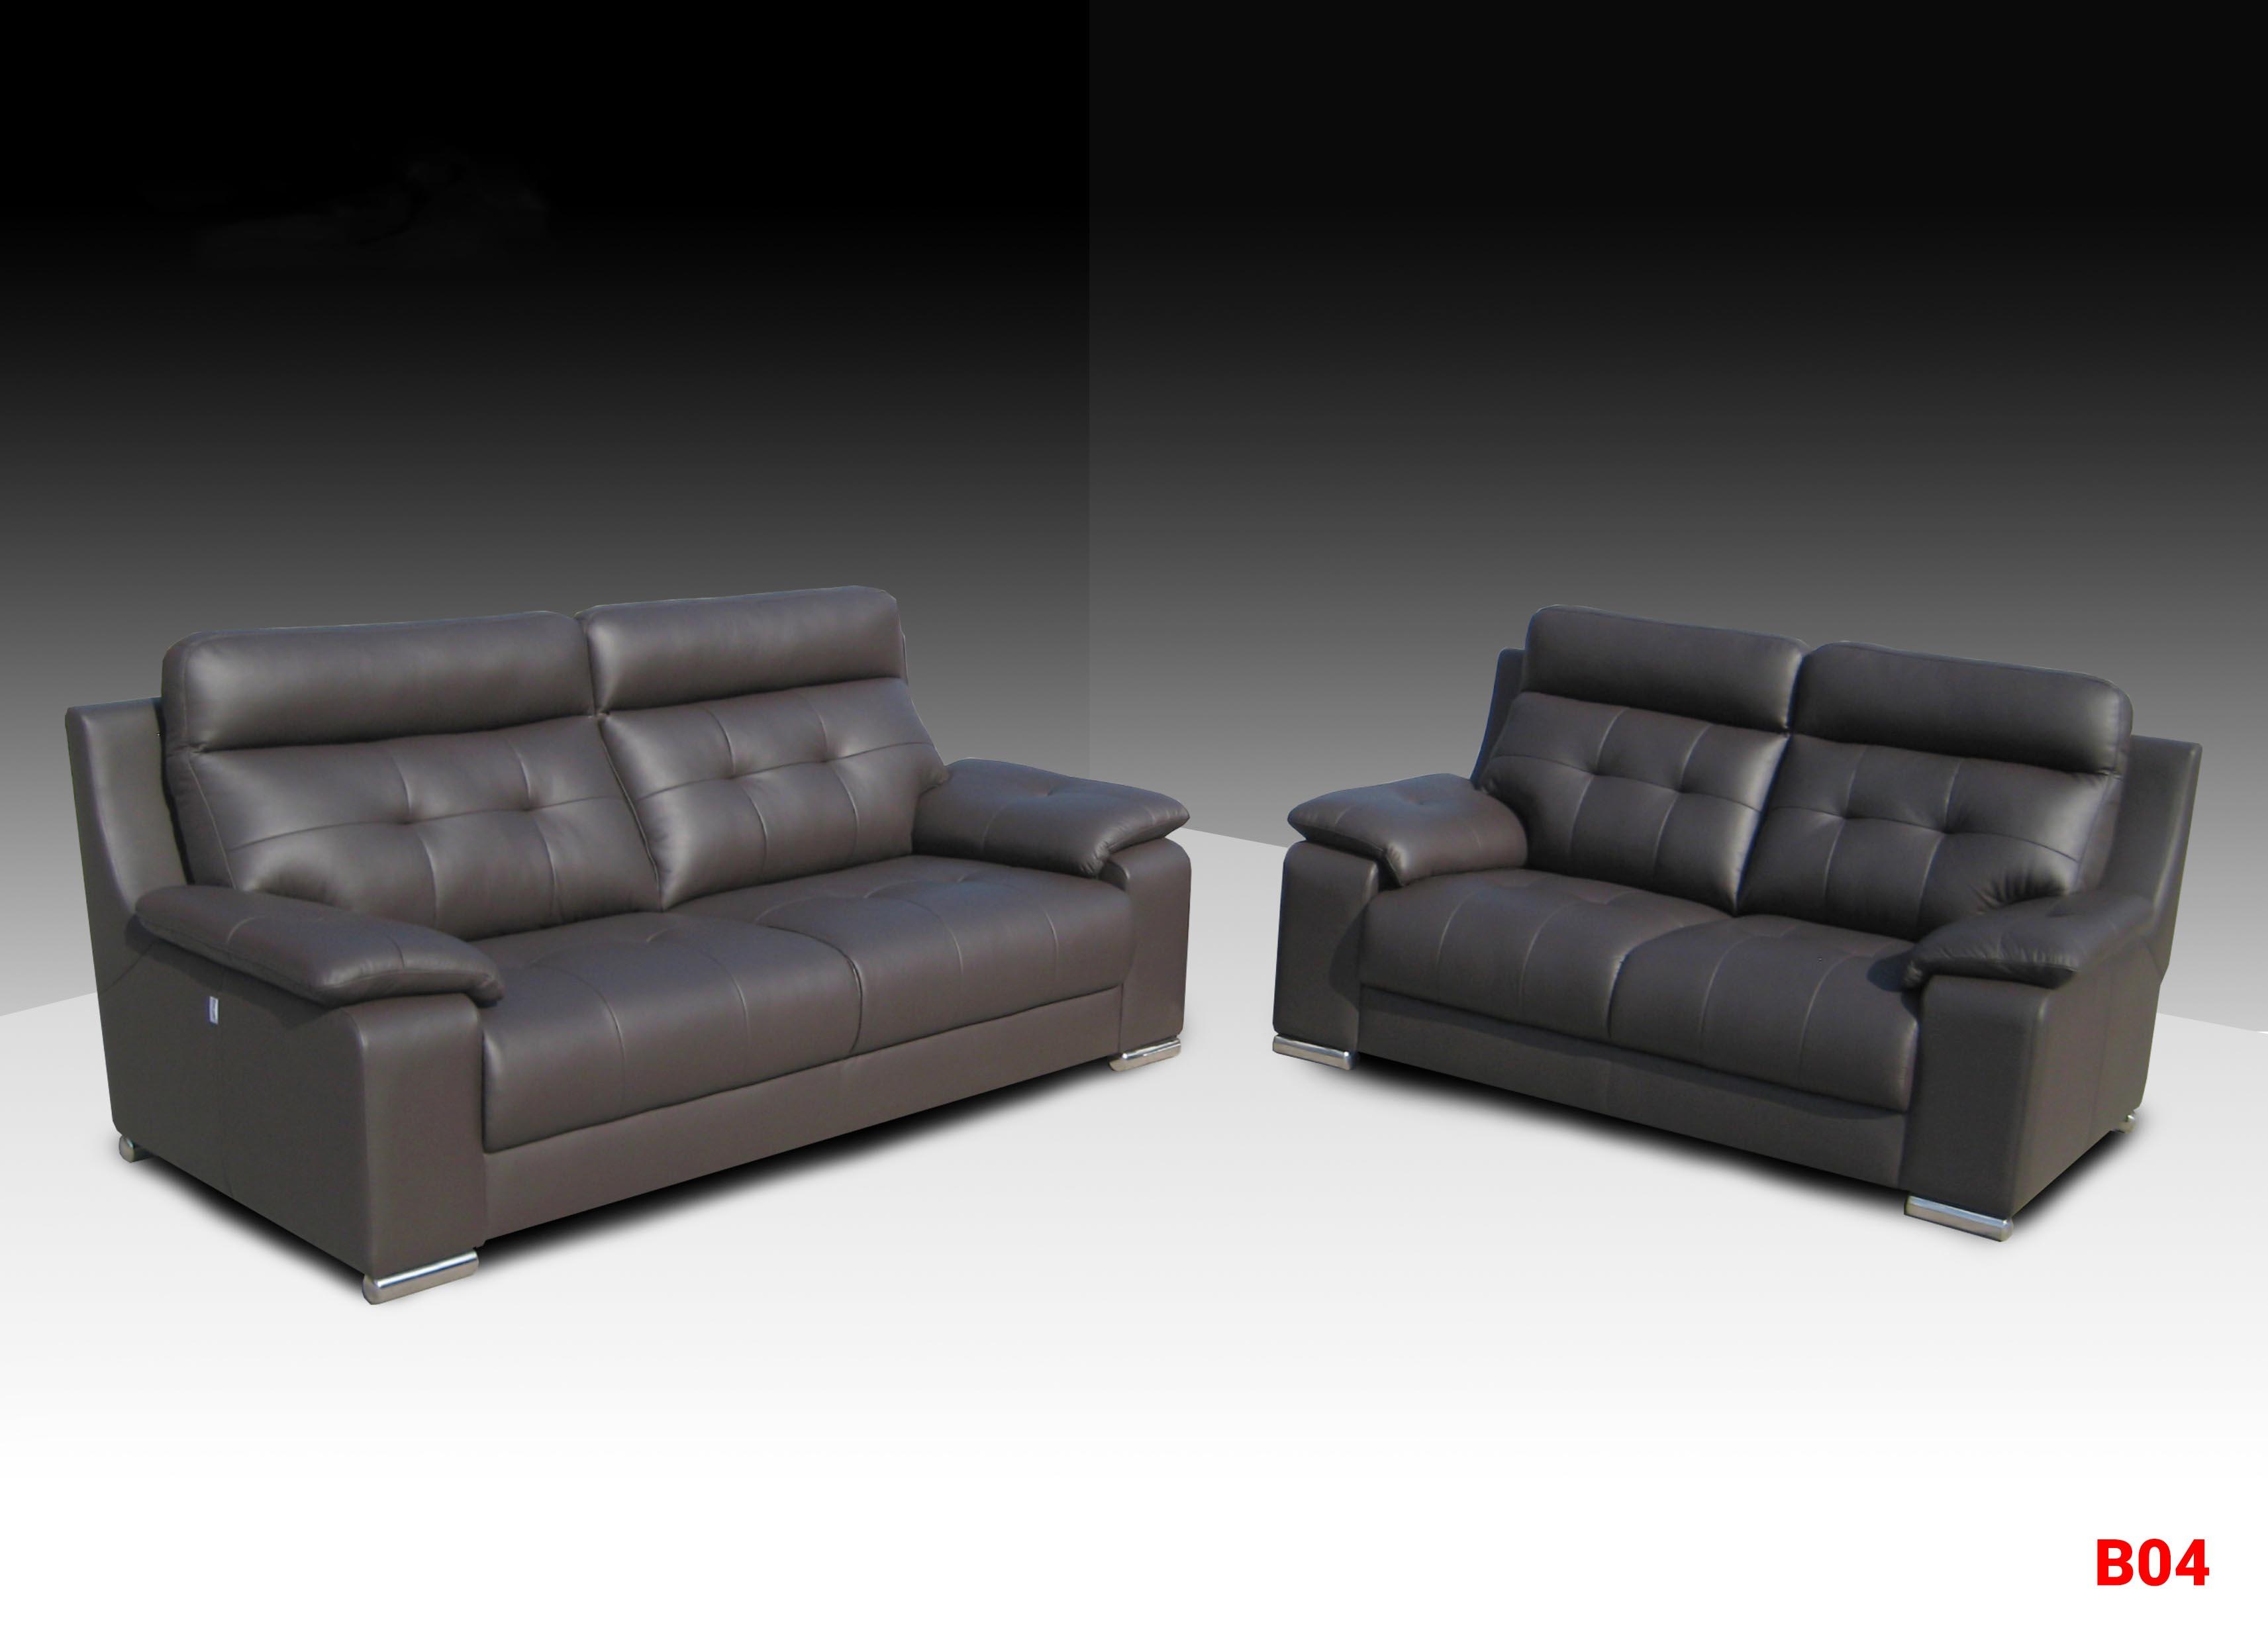 Ghế sofa da phòng khách B04